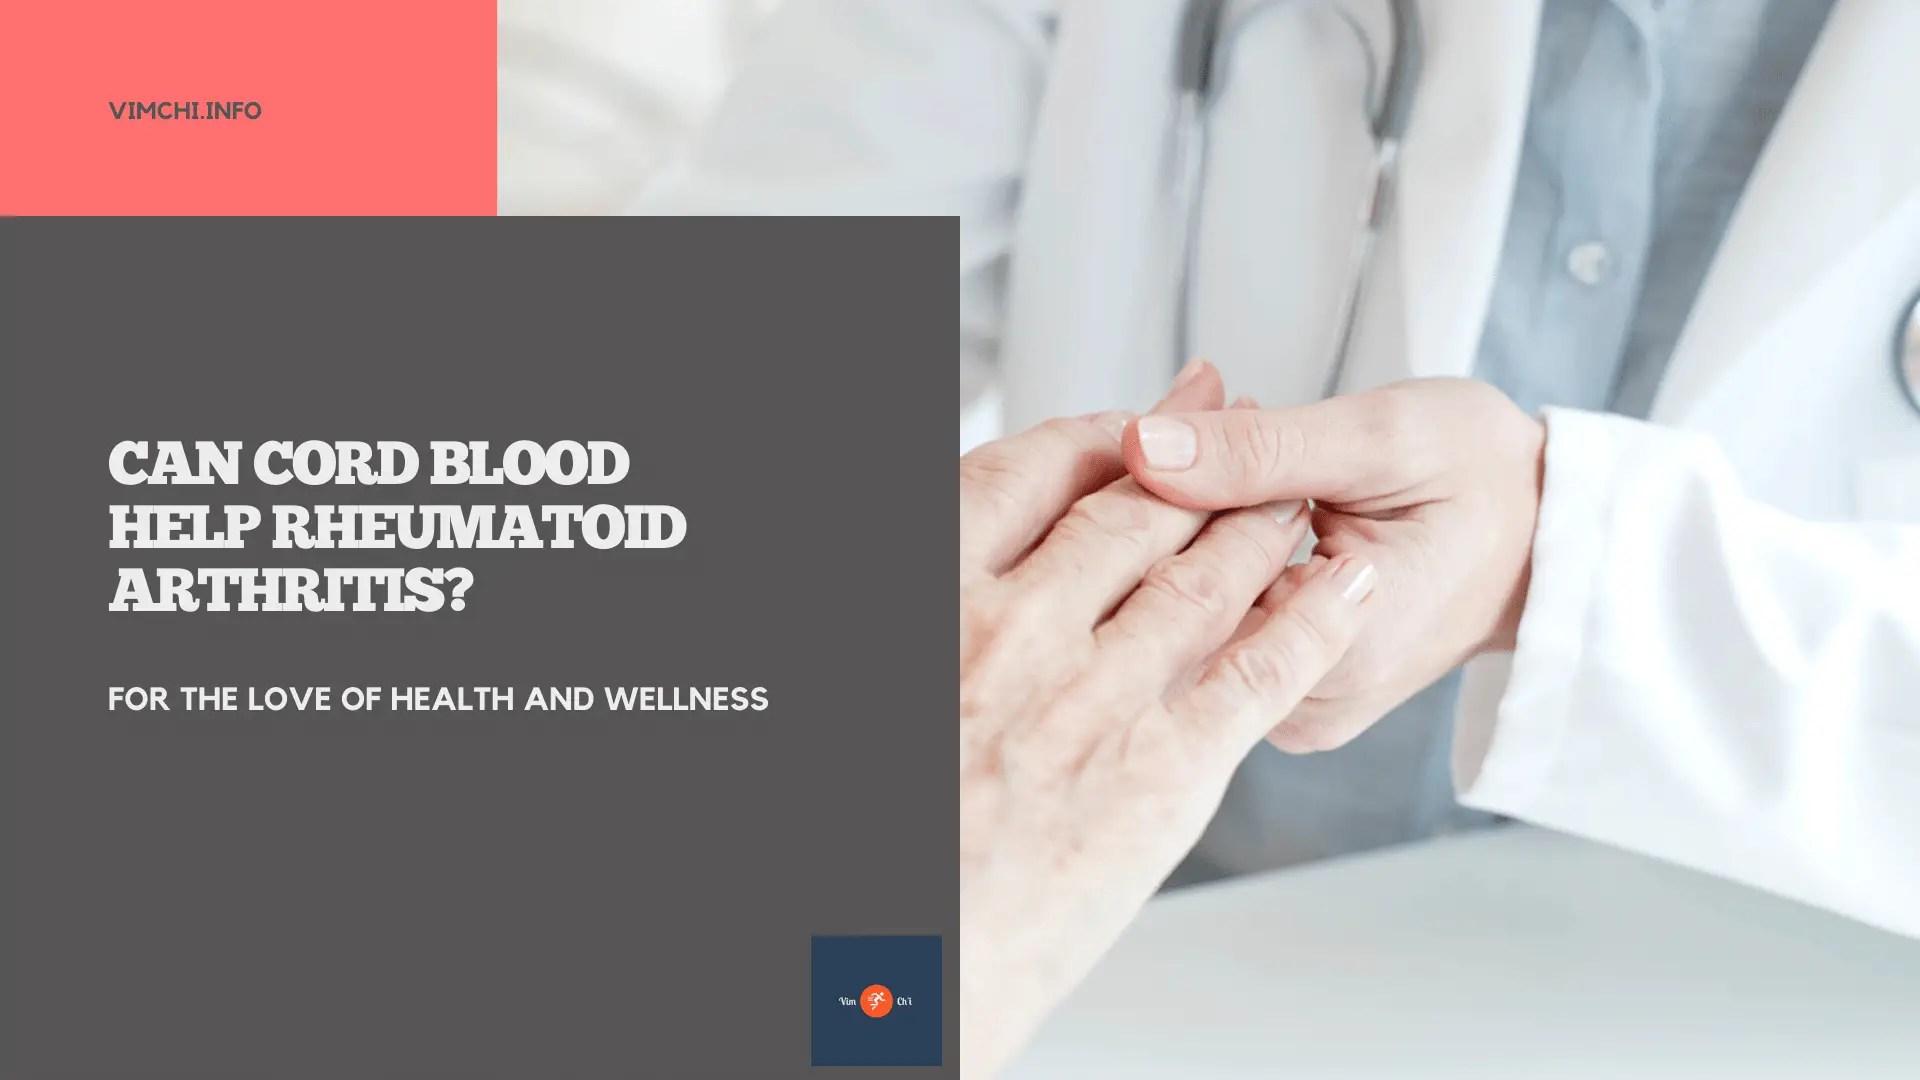 can cord blood help rheumatoid arthritis